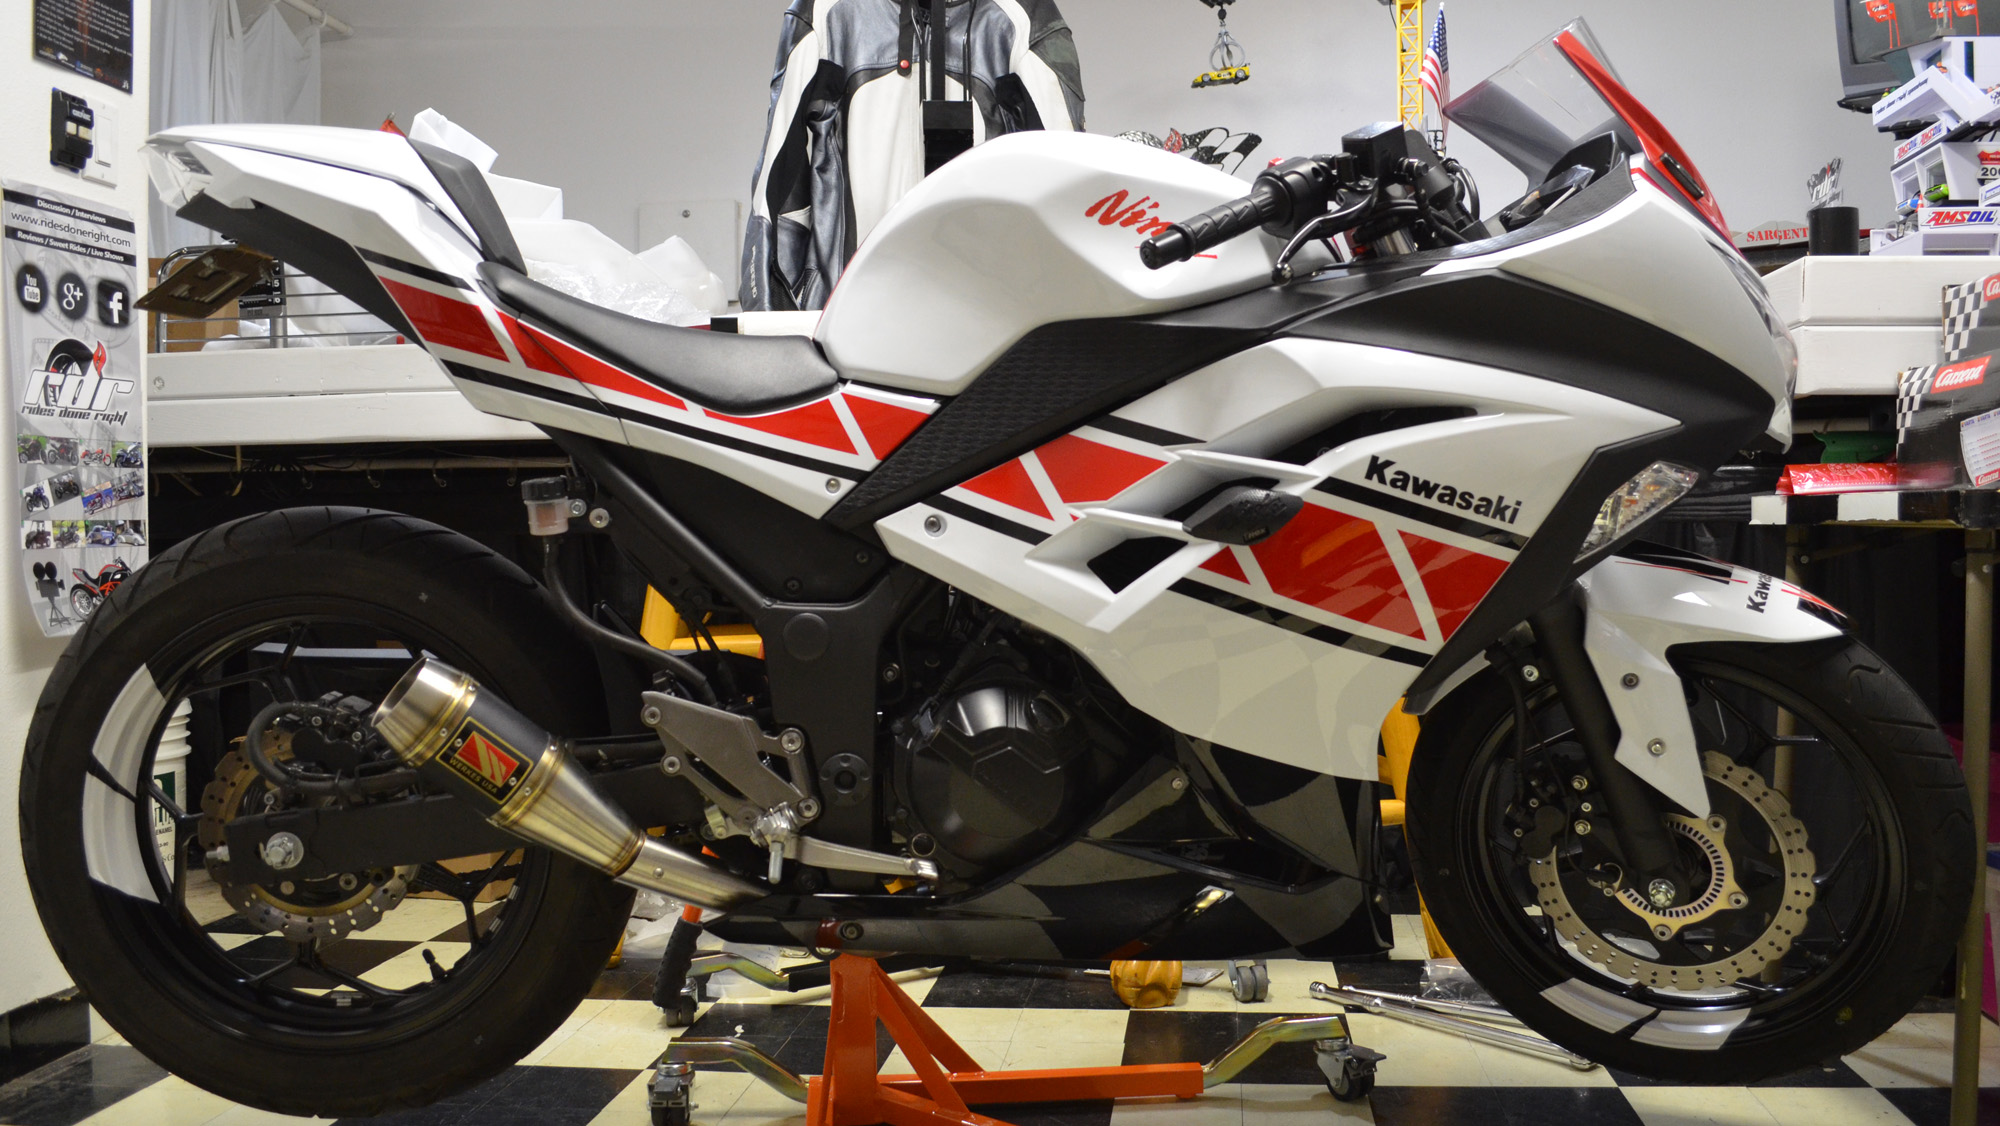 2014 Kawasaki Ninja 300 For The 2017 Return To Track Days Series